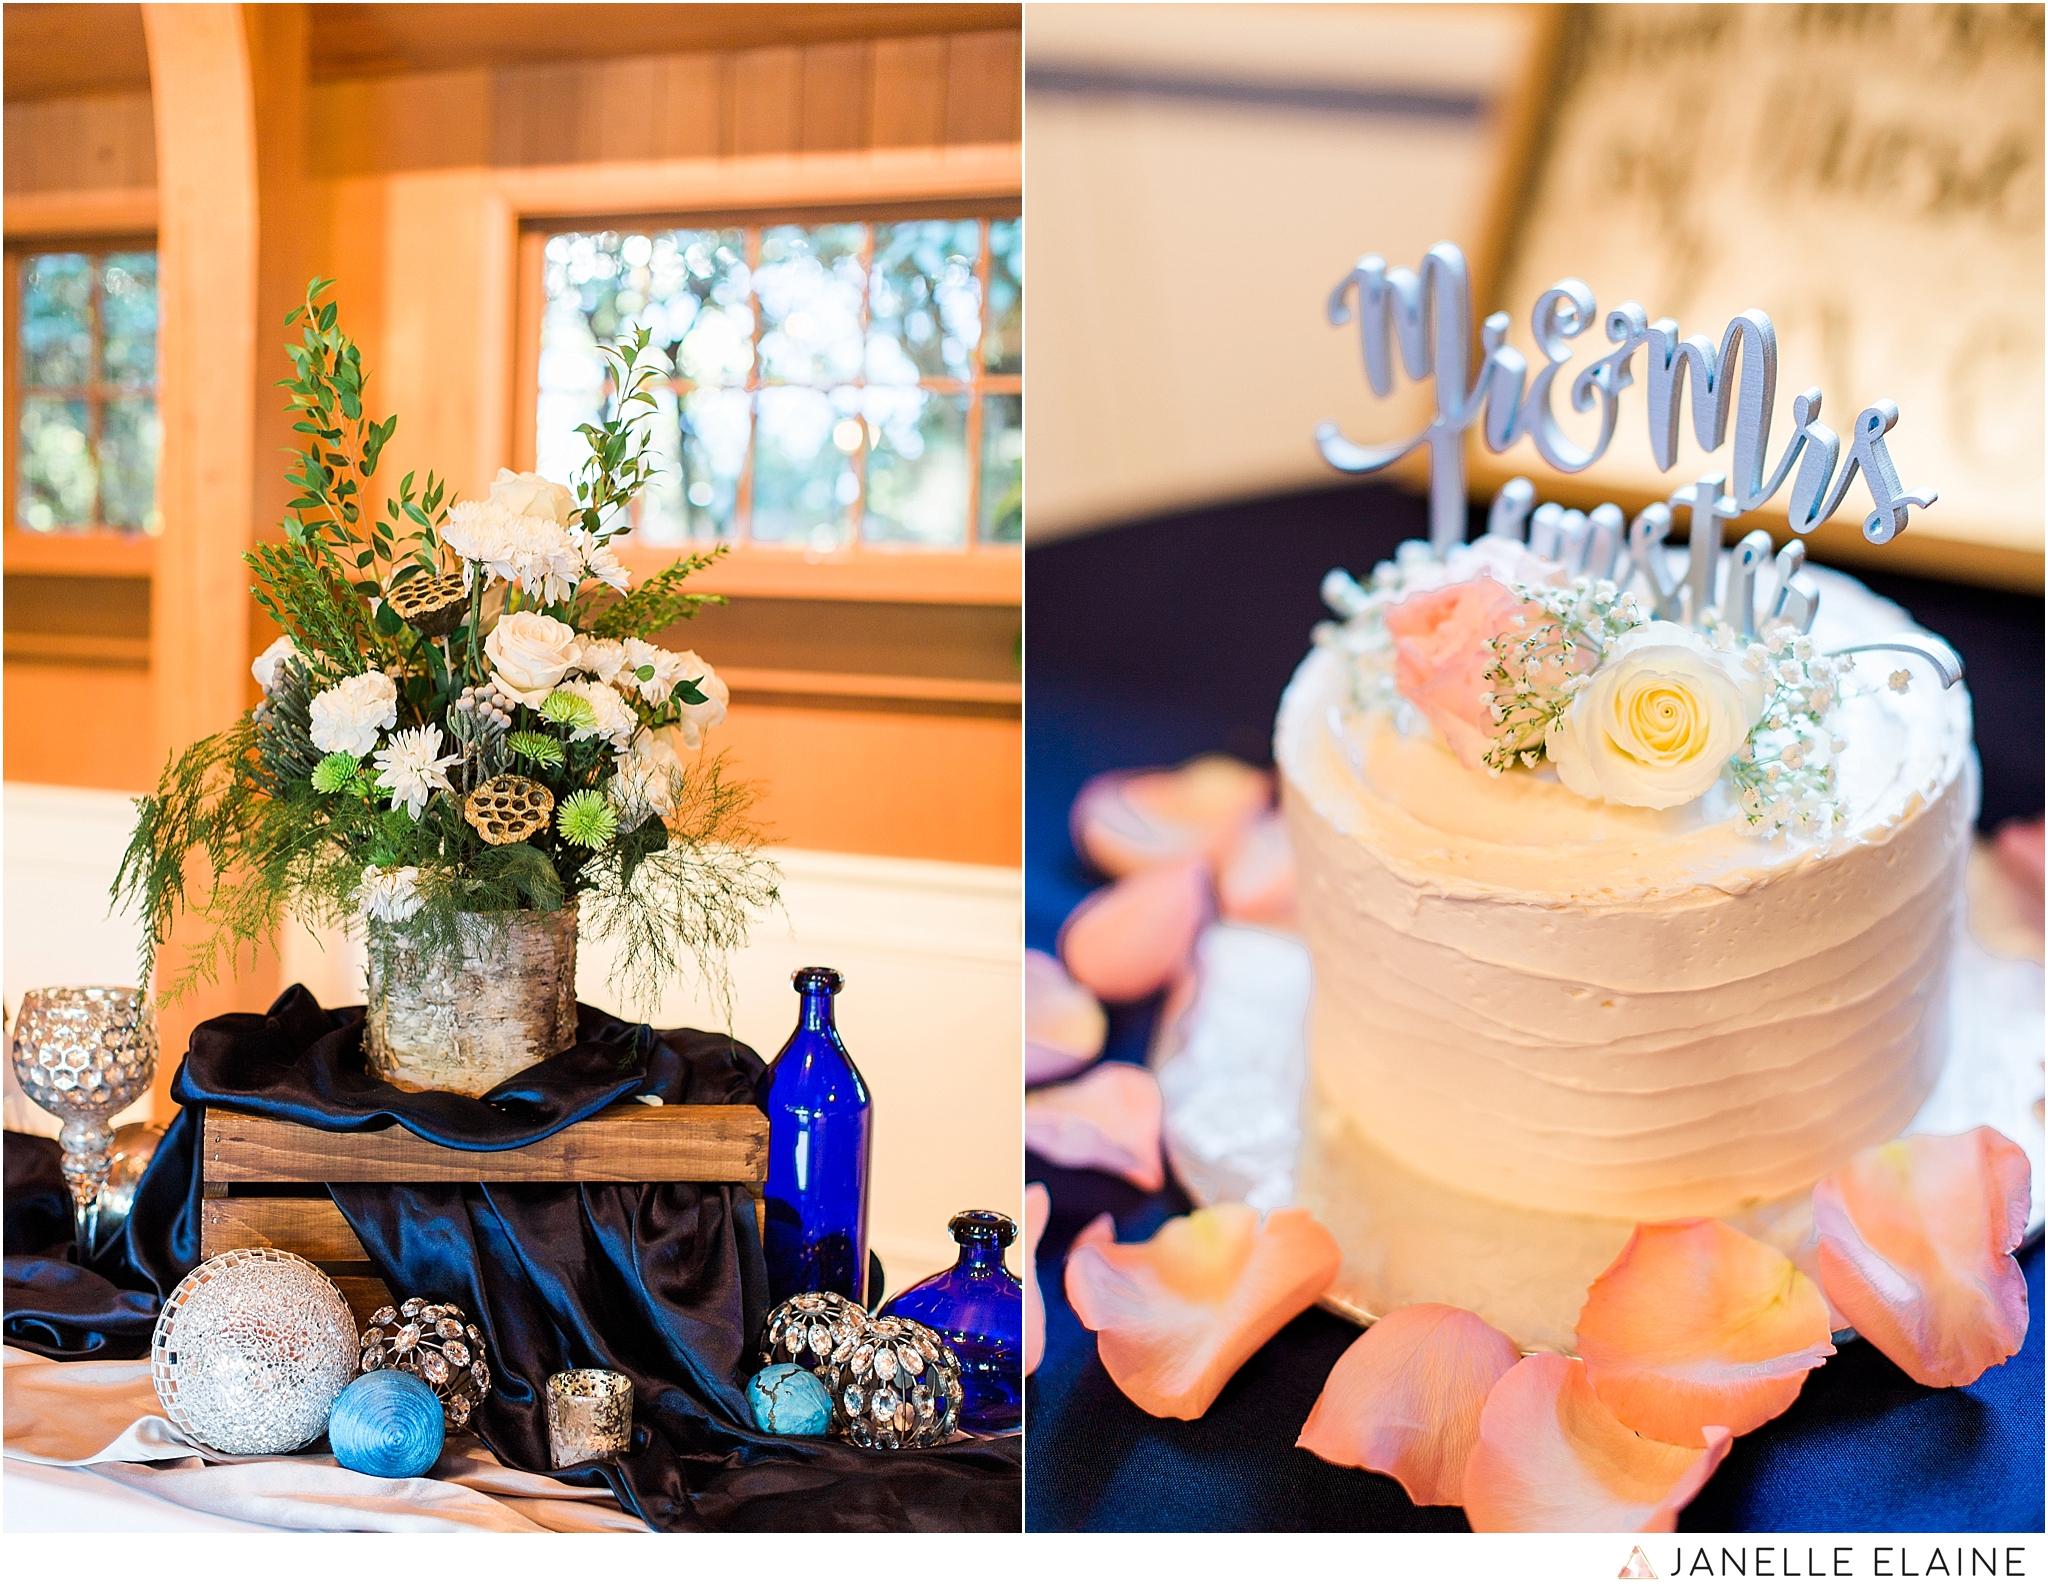 janelle elaine photography-professional wedding photographer-seattle-bellevue-robinswood house-116.jpg